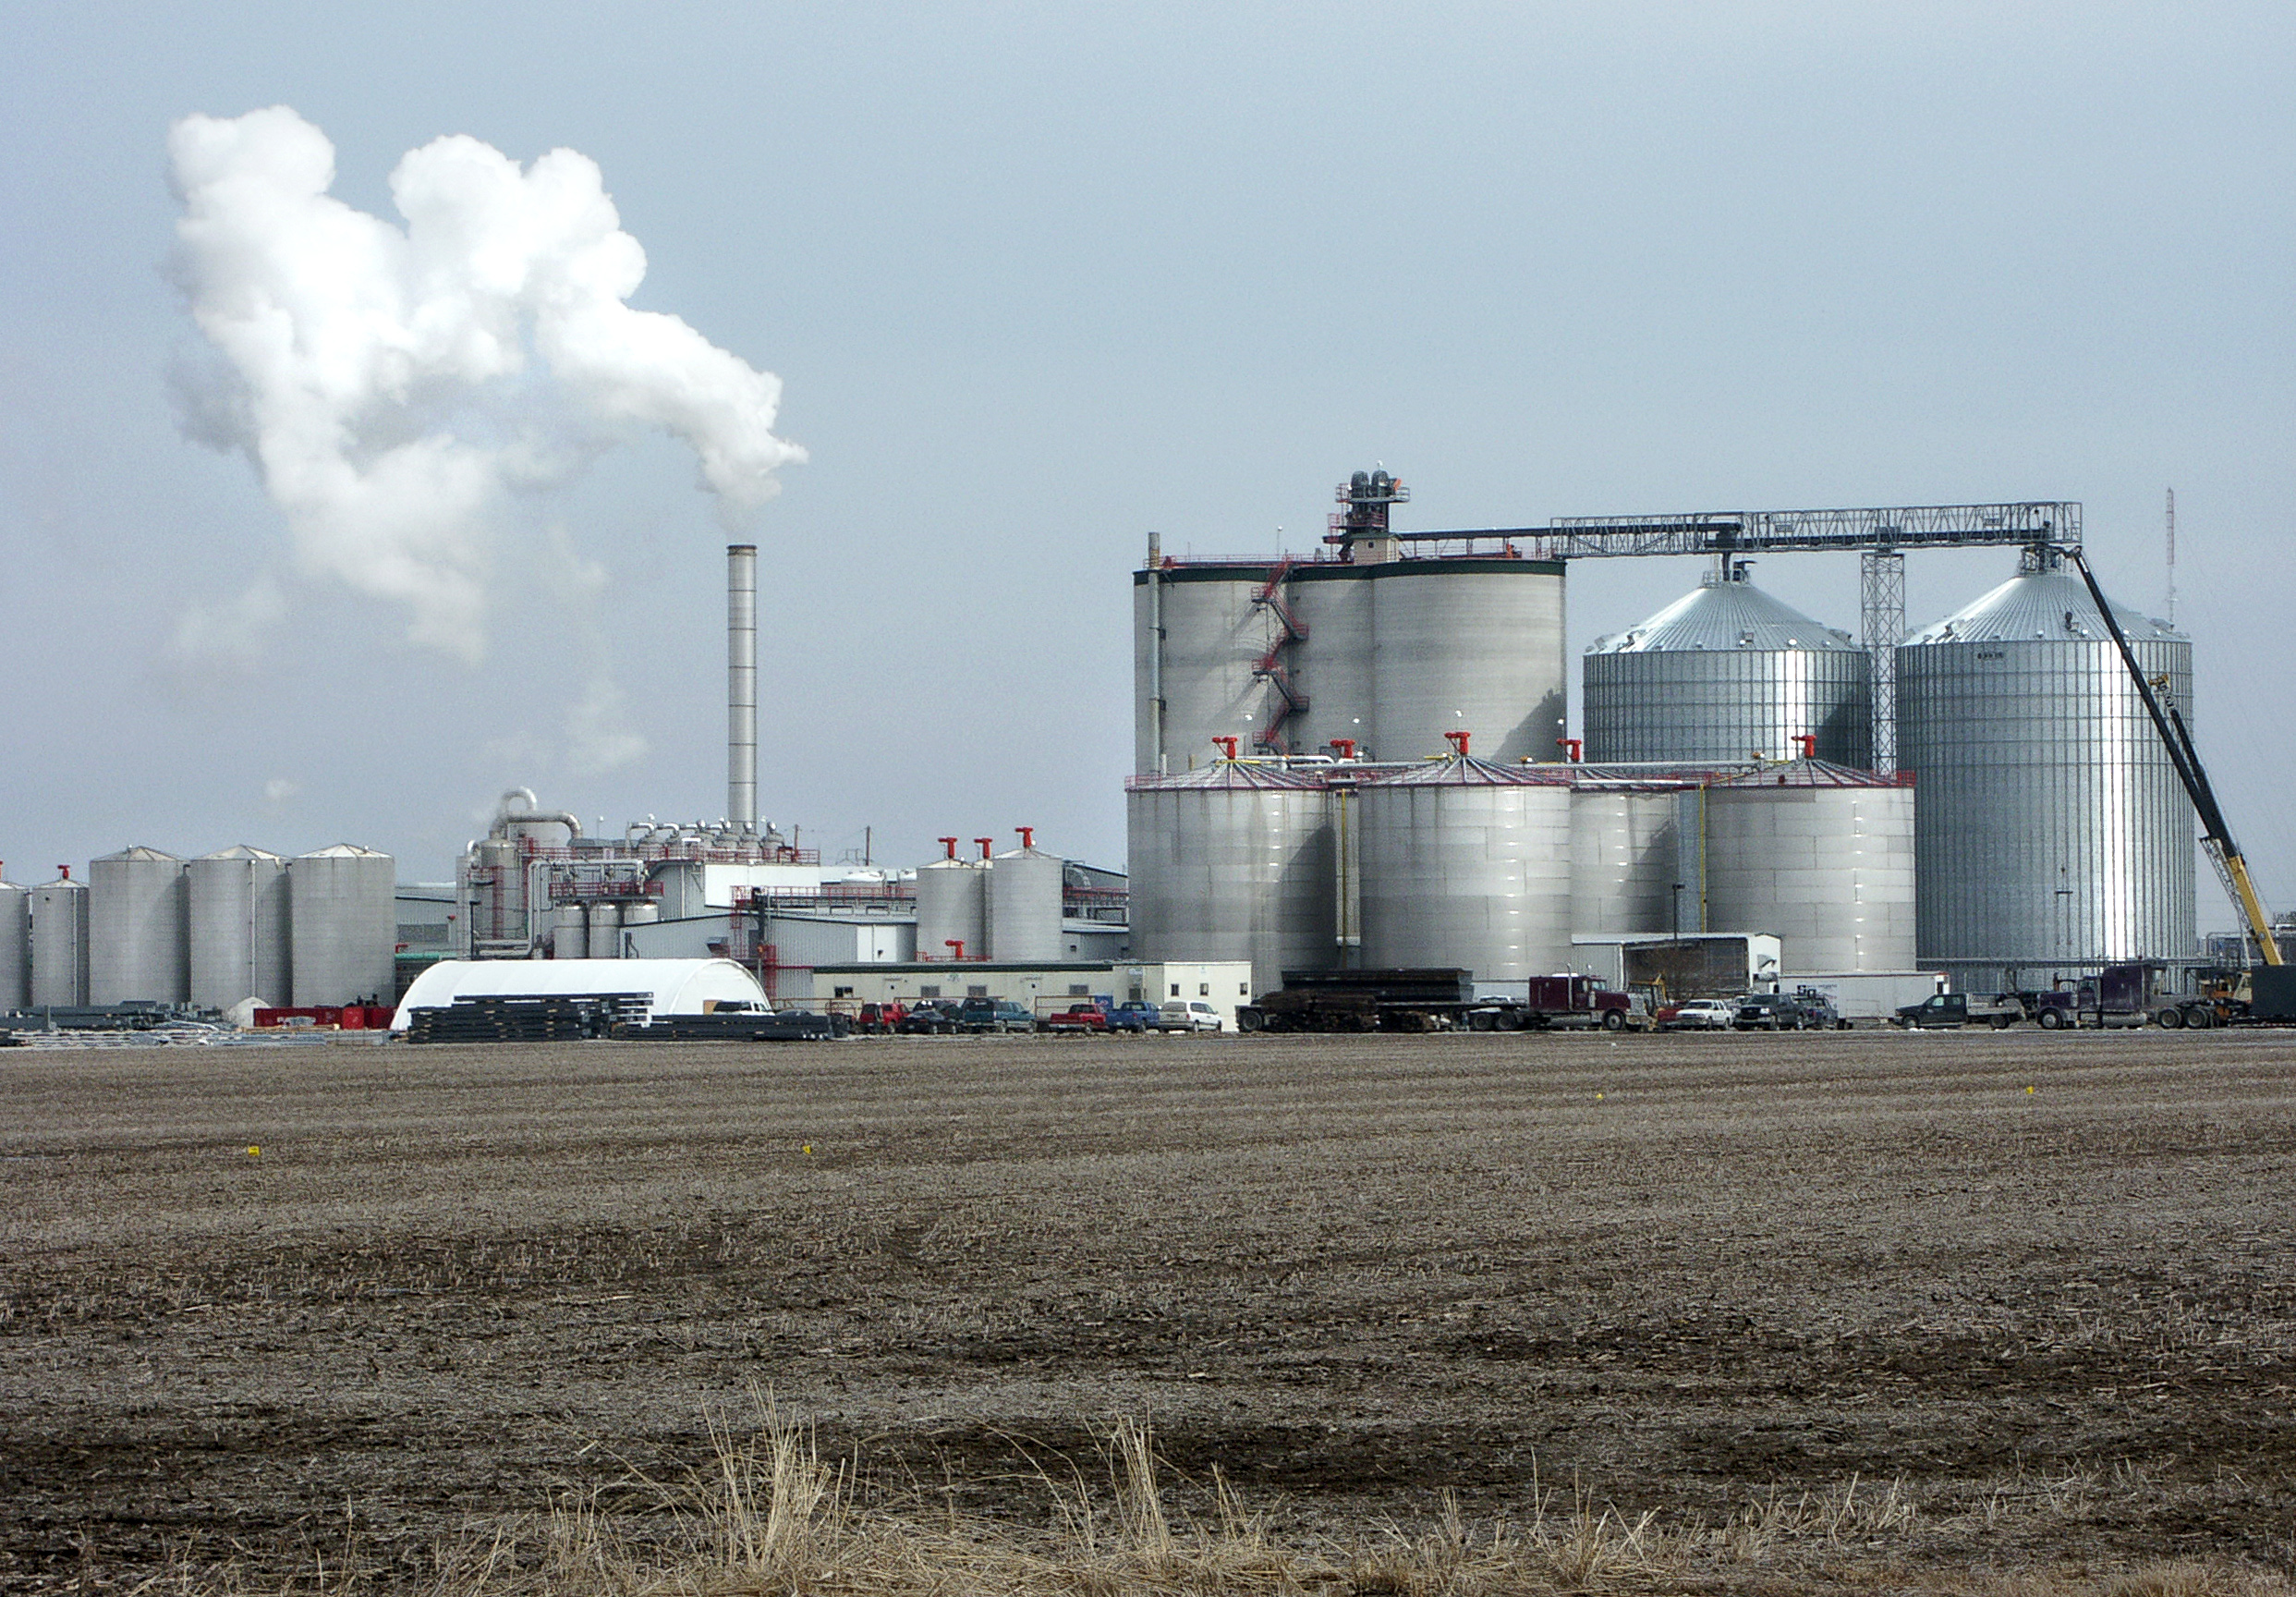 https://i2.wp.com/upload.wikimedia.org/wikipedia/commons/3/35/Ethanol_plant.jpg